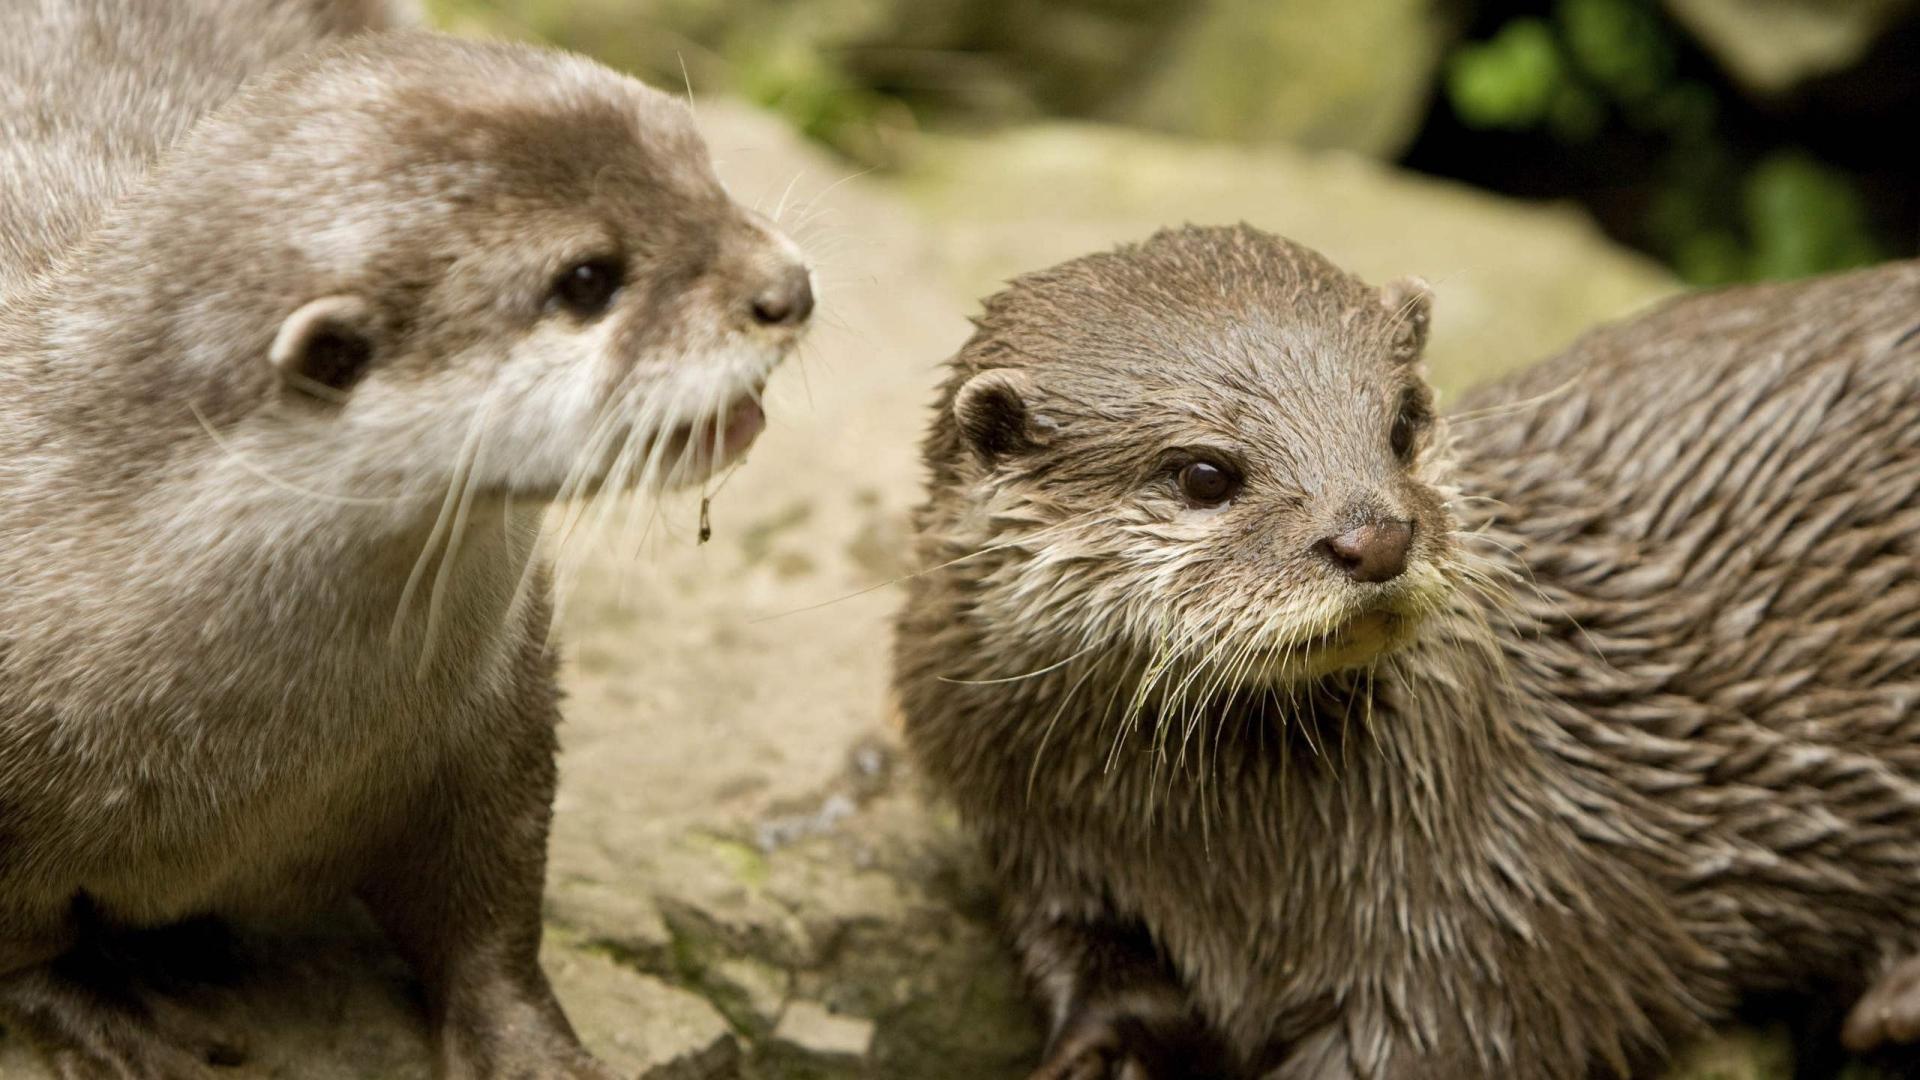 Download Wallpaper 1920x1080 Otter Wet Animal Full Hd